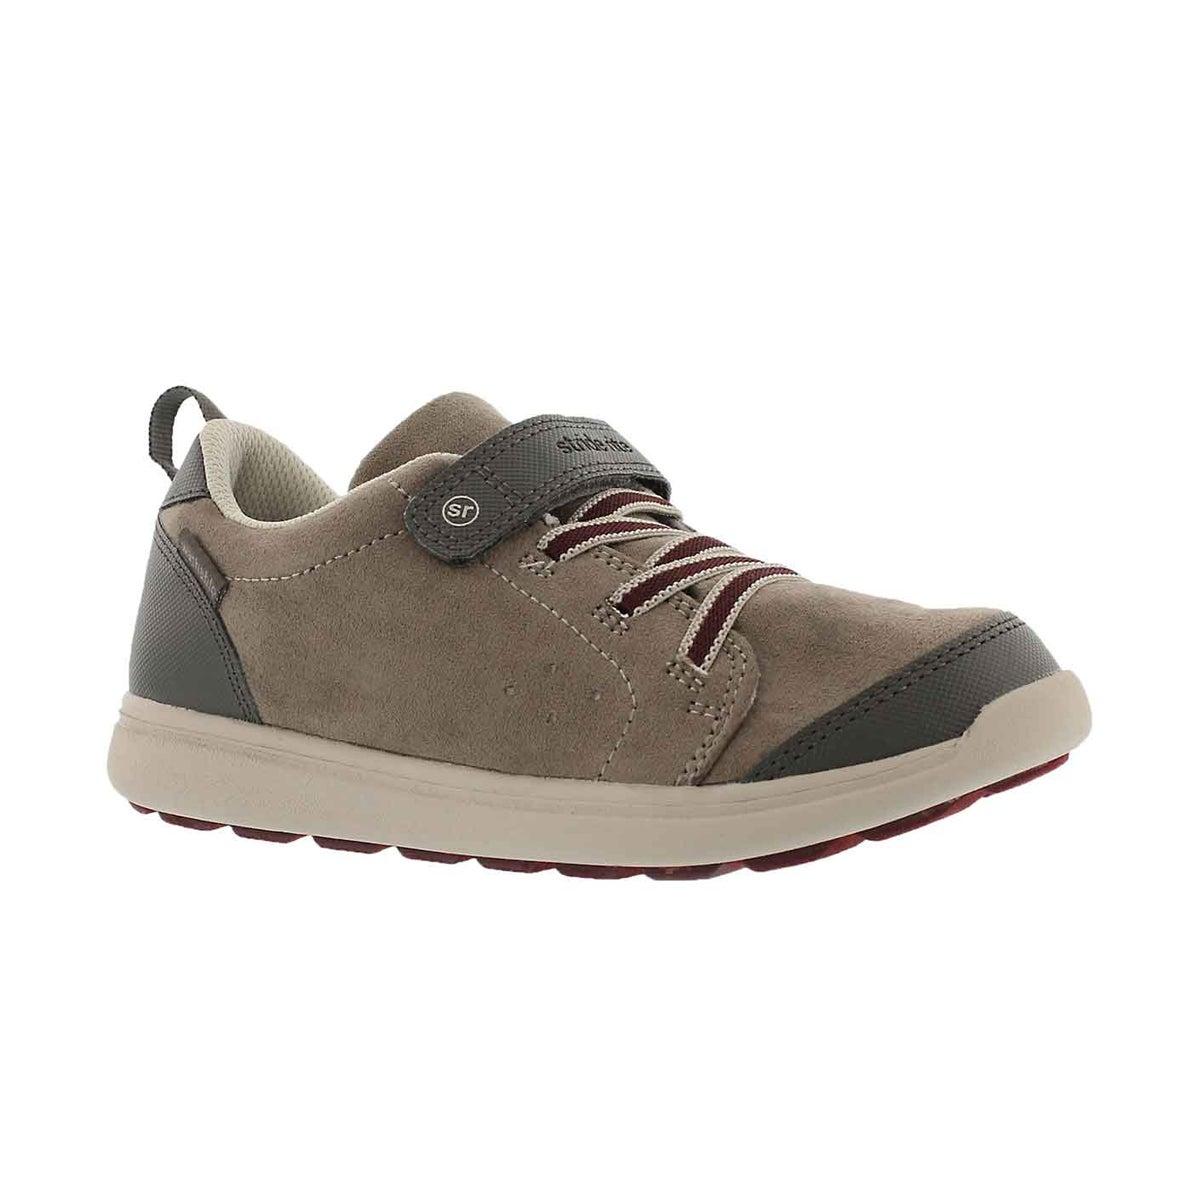 Boys' M2P BONDE truffle sneakers